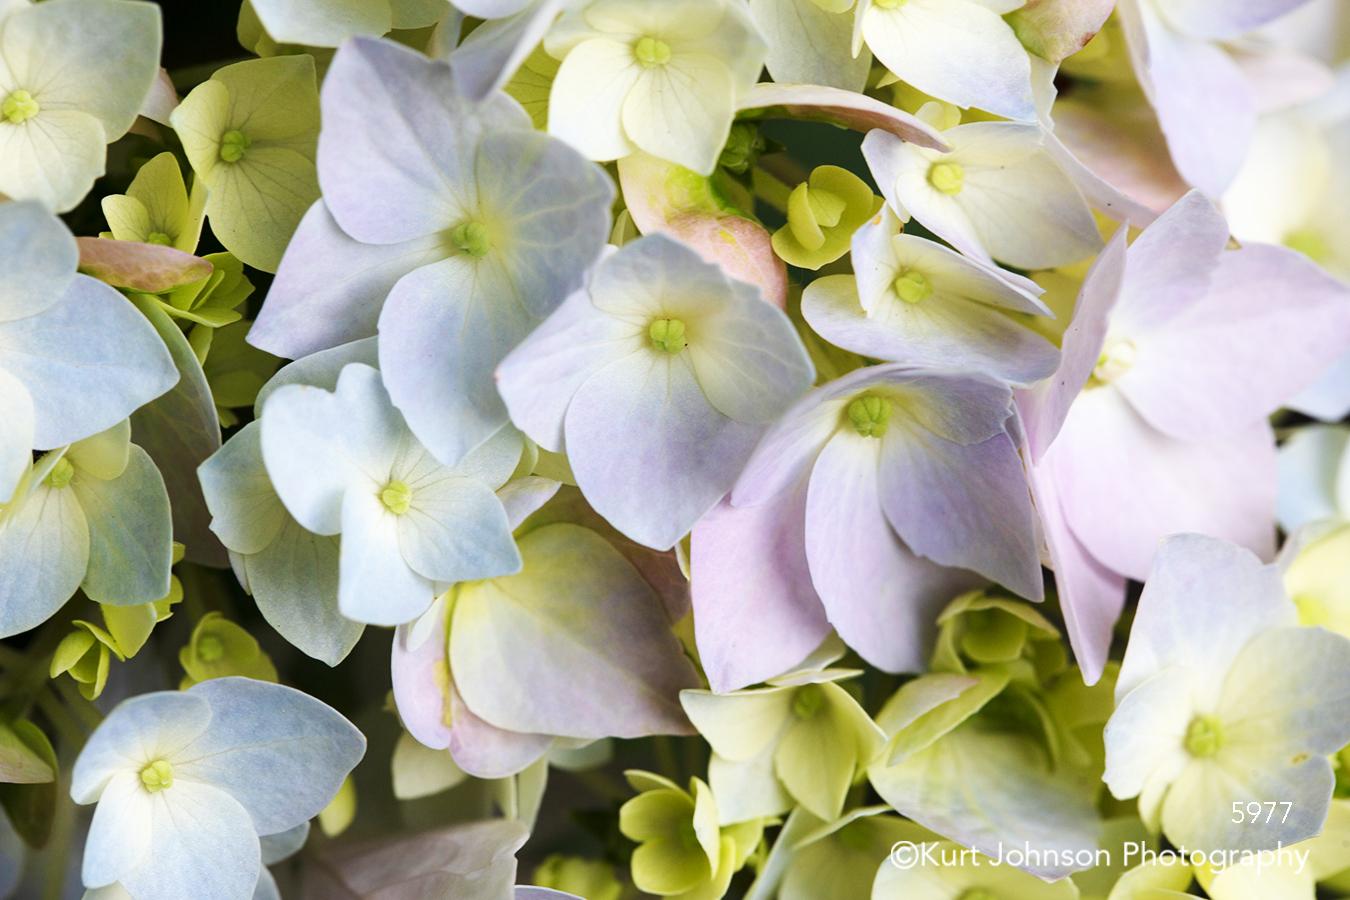 hydrangea flower petals close up detail flowers pastel pink purple blue white macro pattern